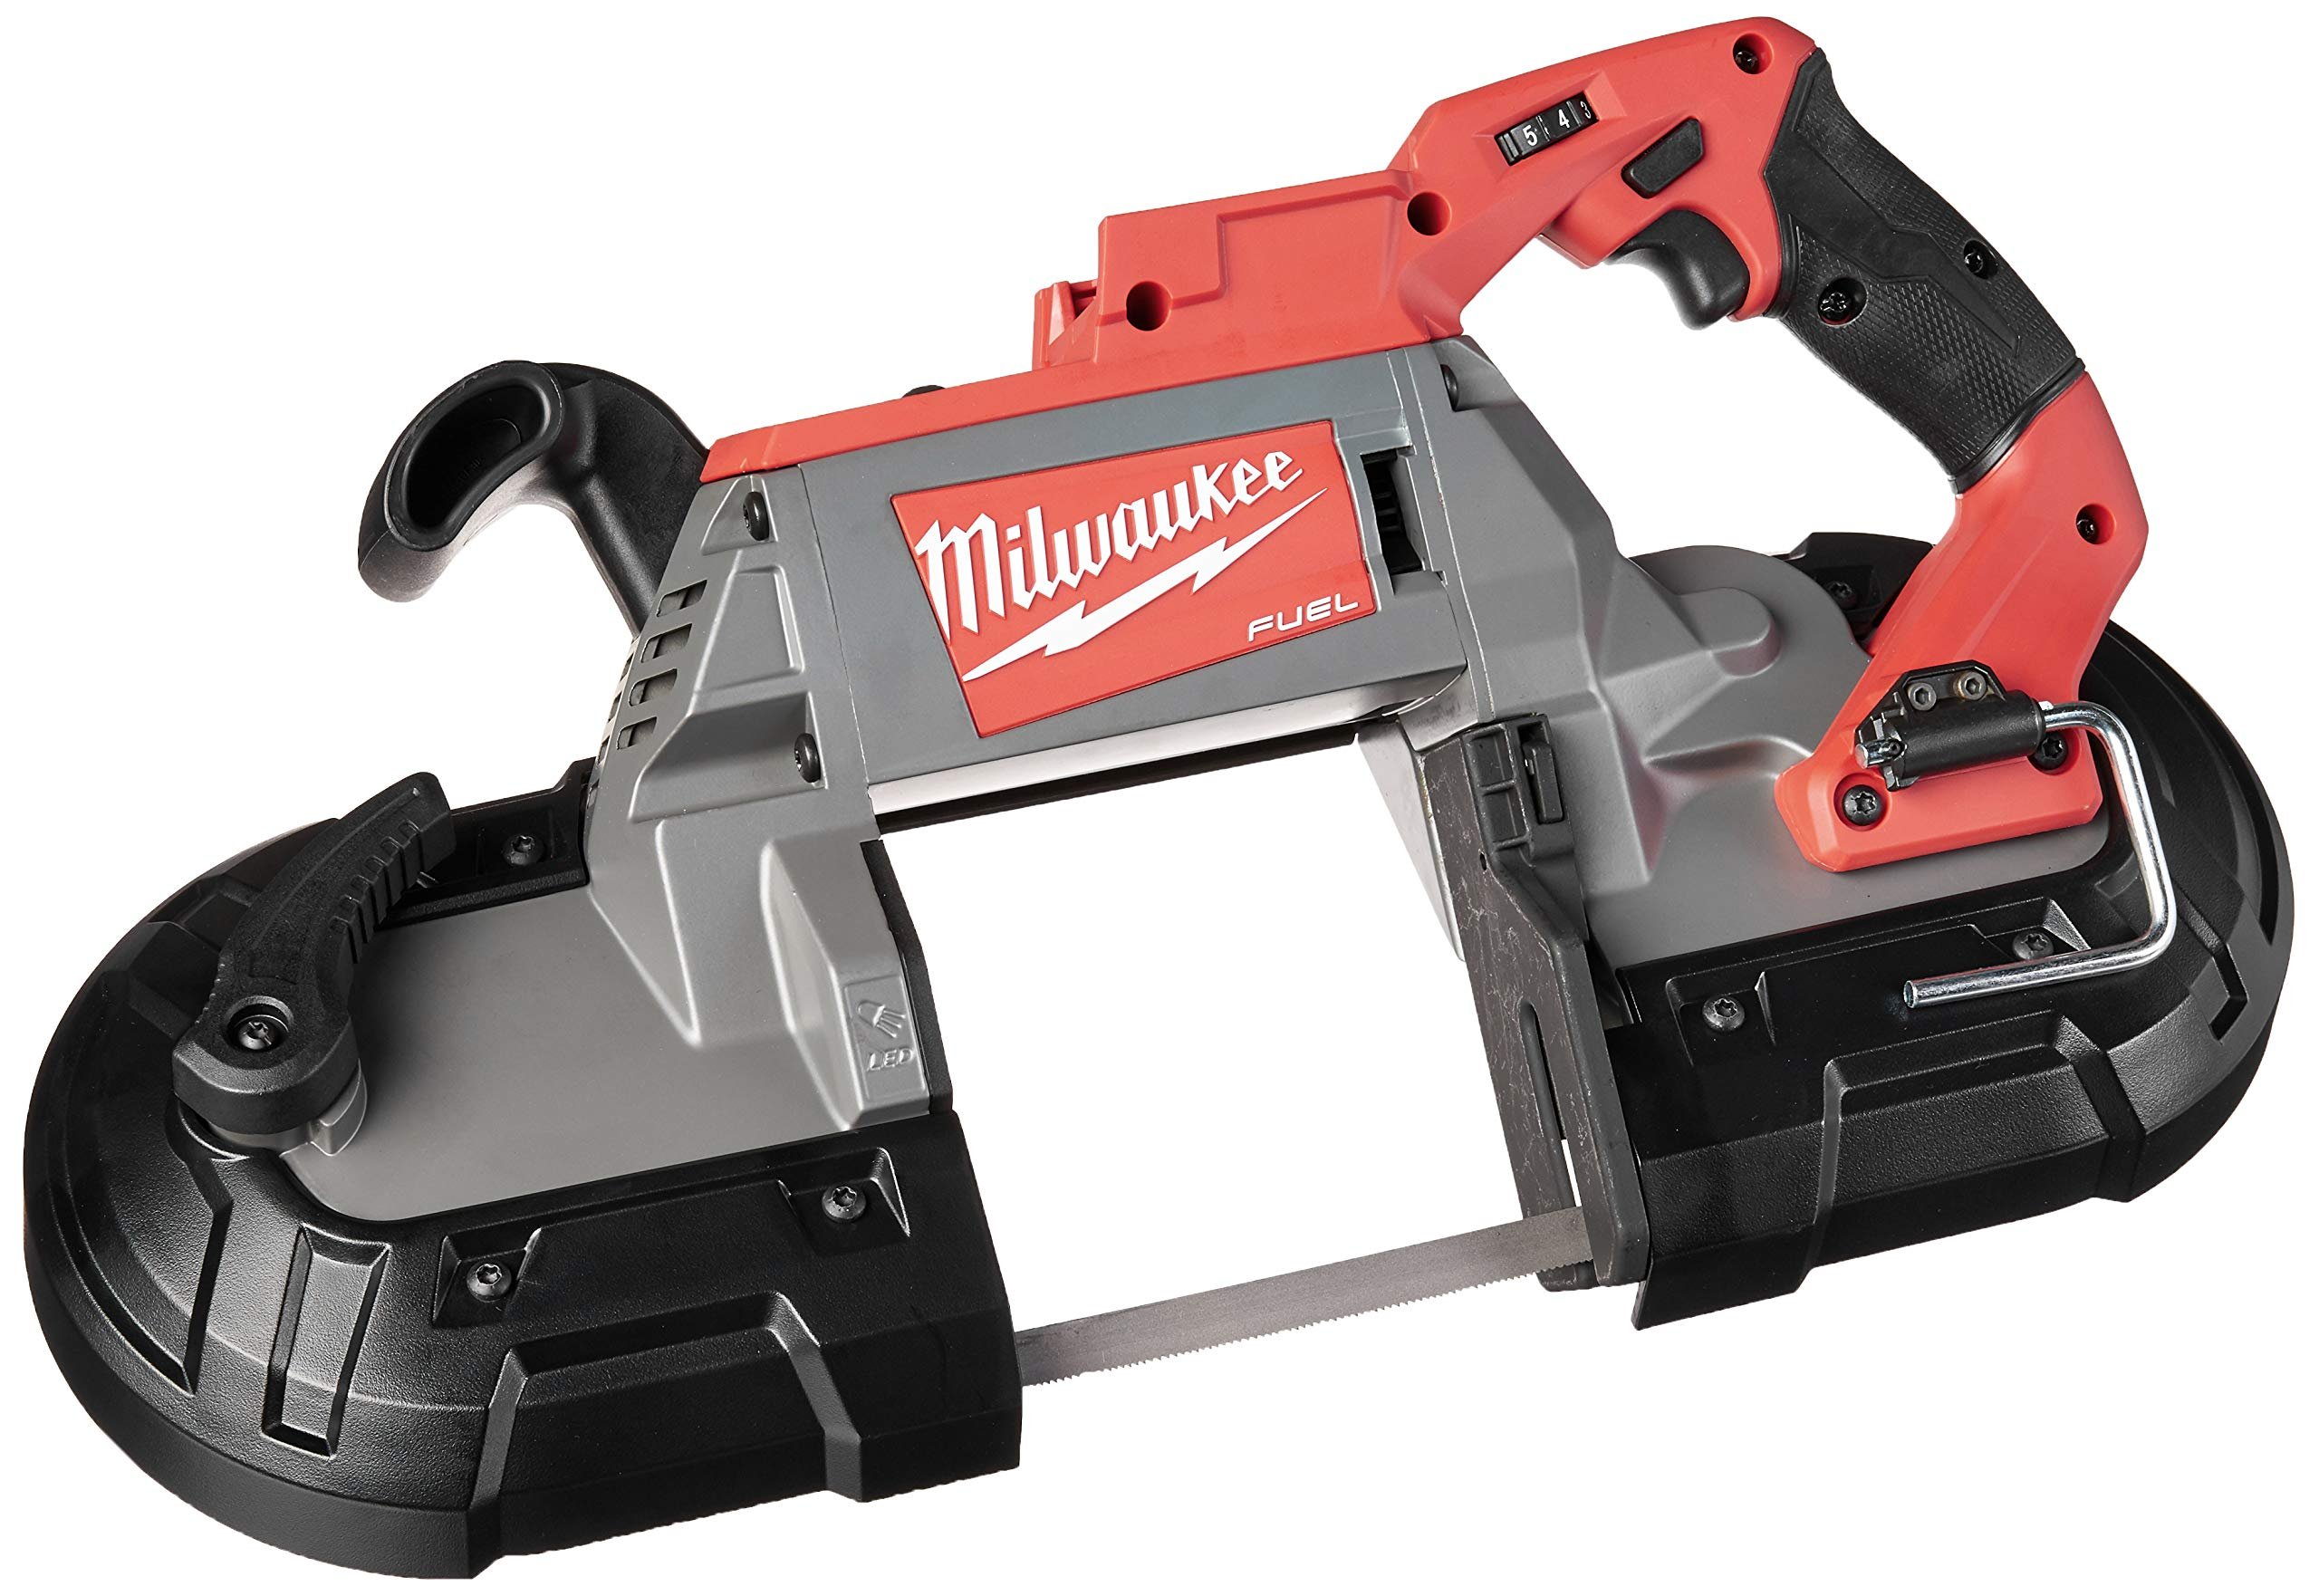 Milwaukee 2729-20 M18 Fuel Deep Cut portable Band Saw